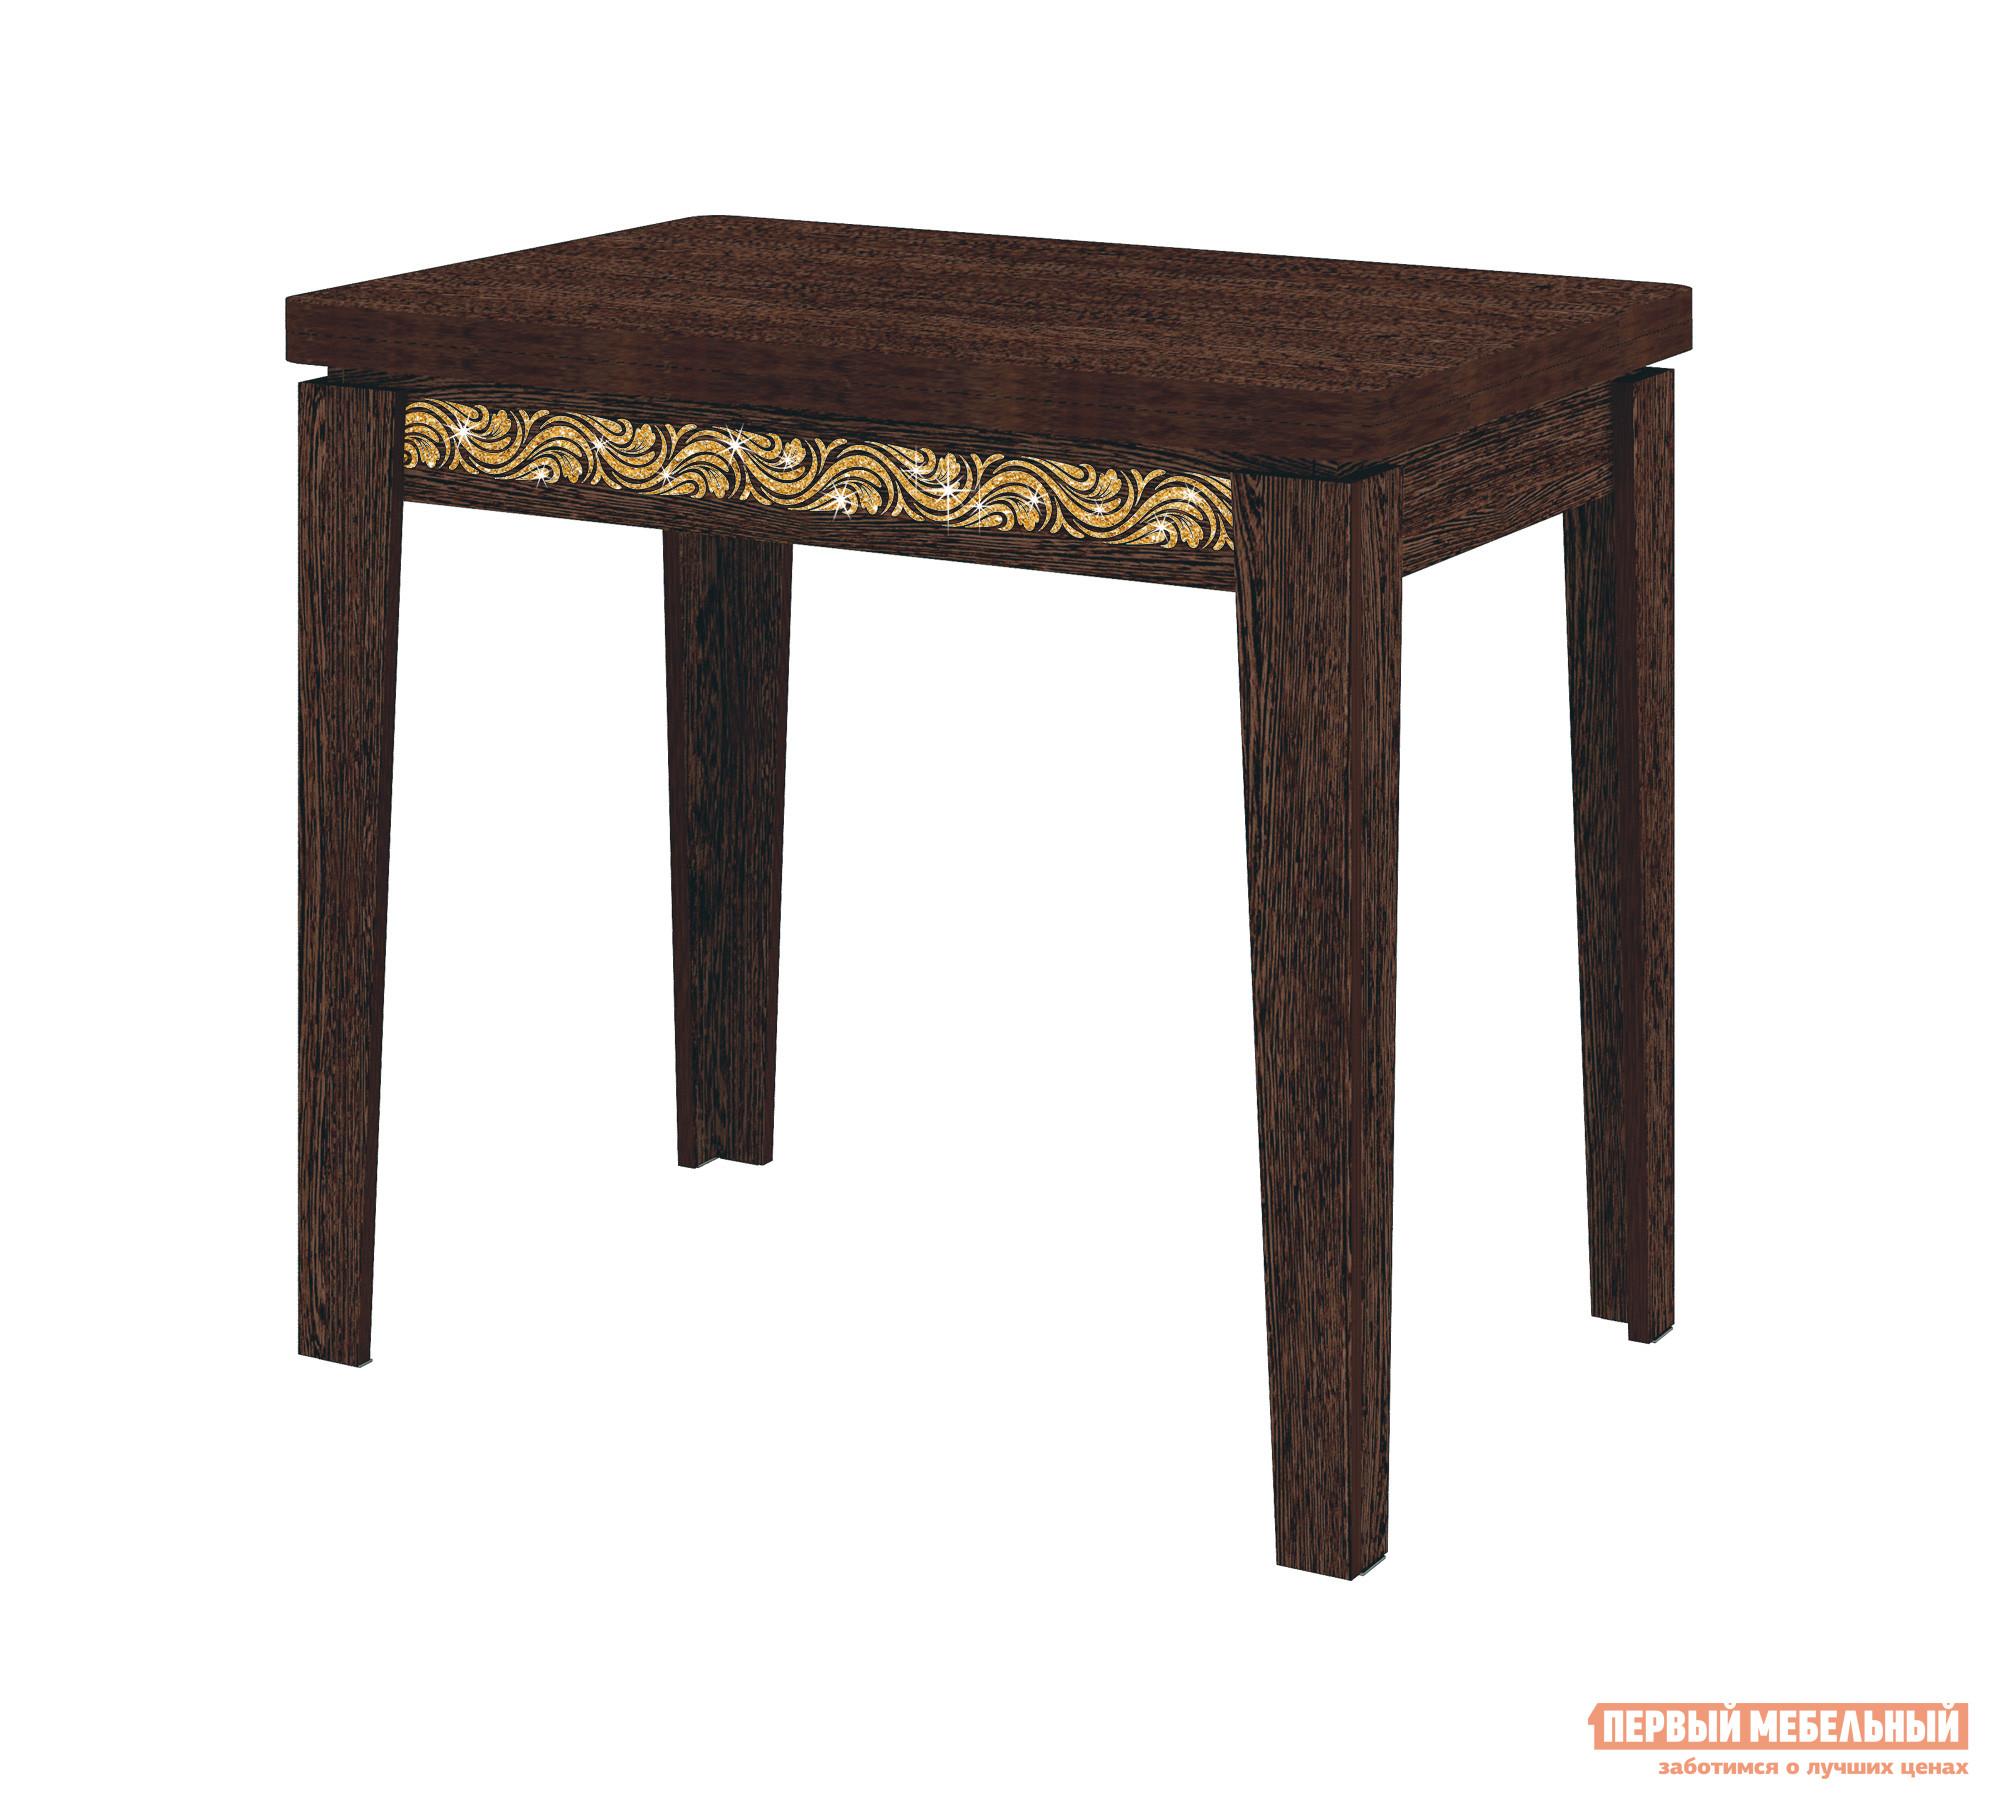 Кухонный стол Витра Орфей-26.10 Лайт Венге